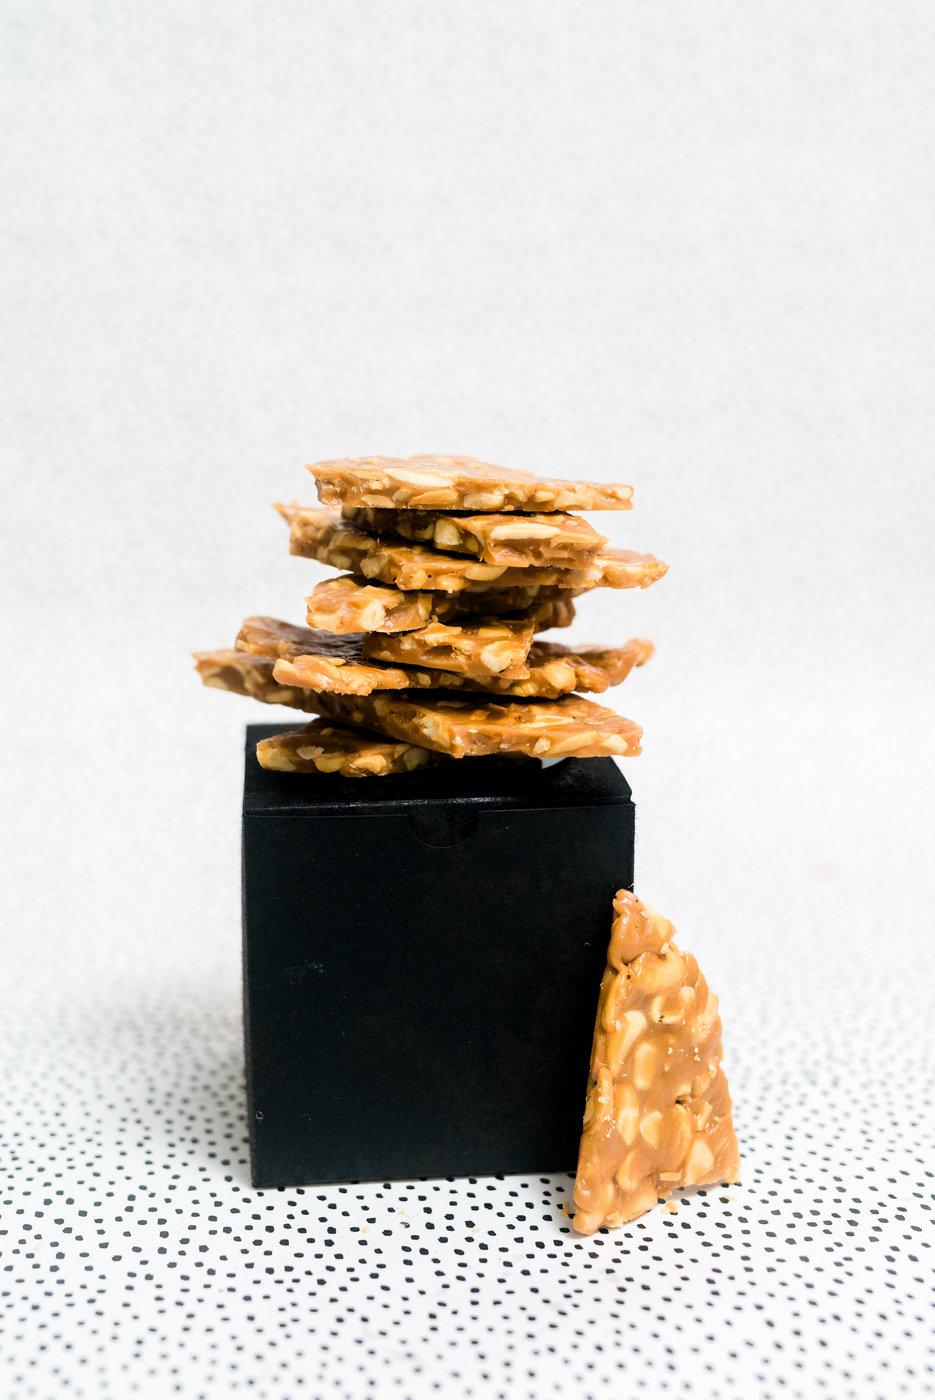 Butter toffee cashew brittle   Haley Richter Photography